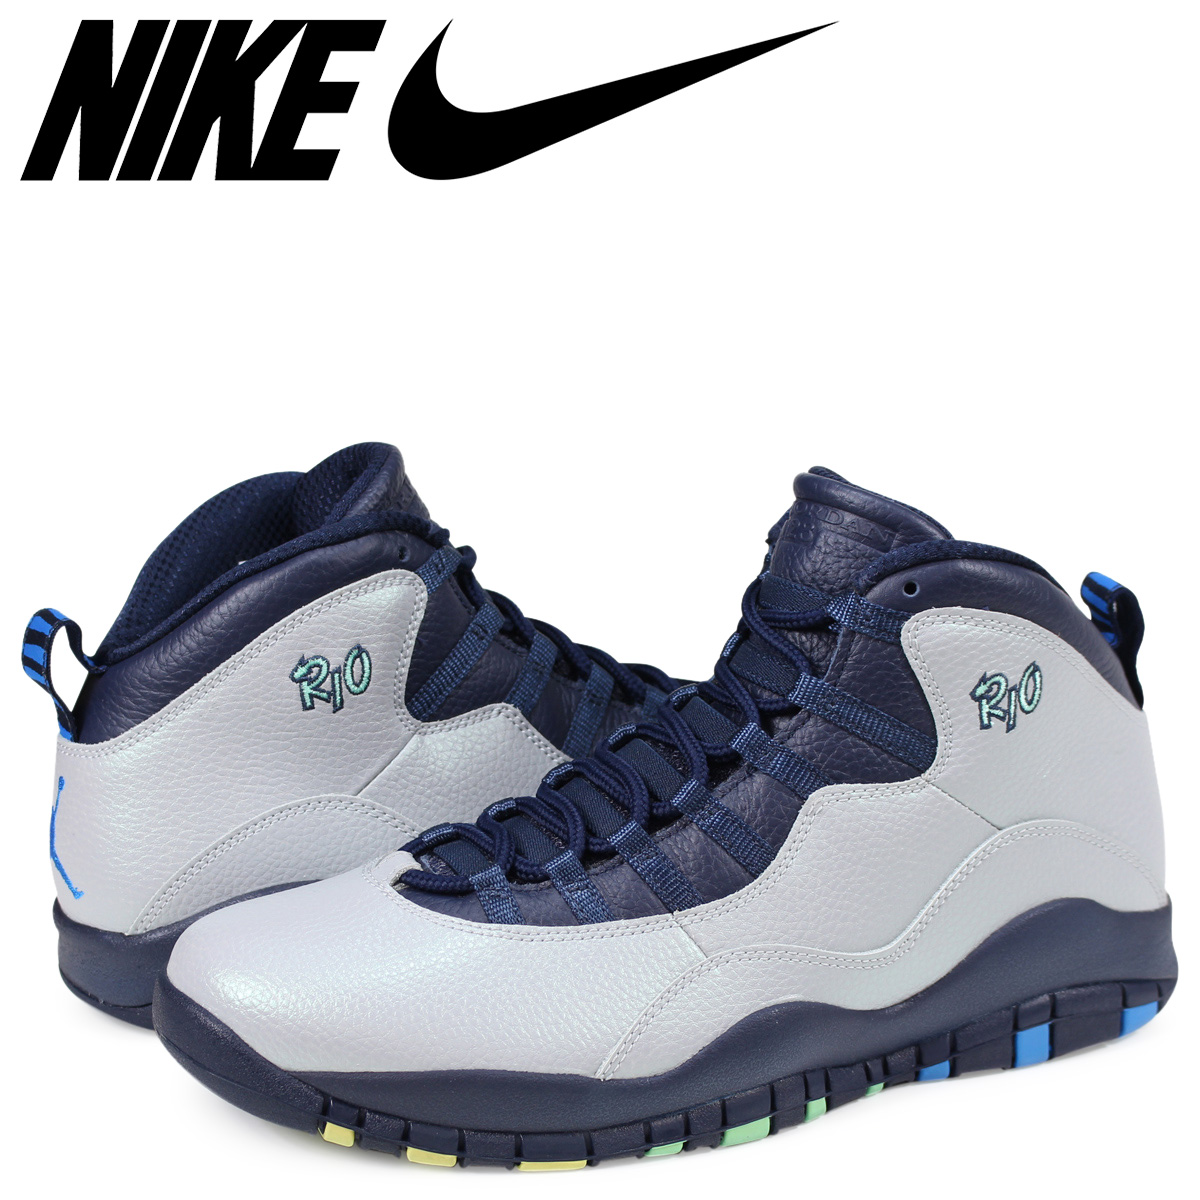 f1d25dd71038bd  SOLD OUT  NIKE Nike Air Jordan sneakers AIR JORDAN 10 RETRO RIO Air Jordan  10 retro 310805 - 019 grey mens